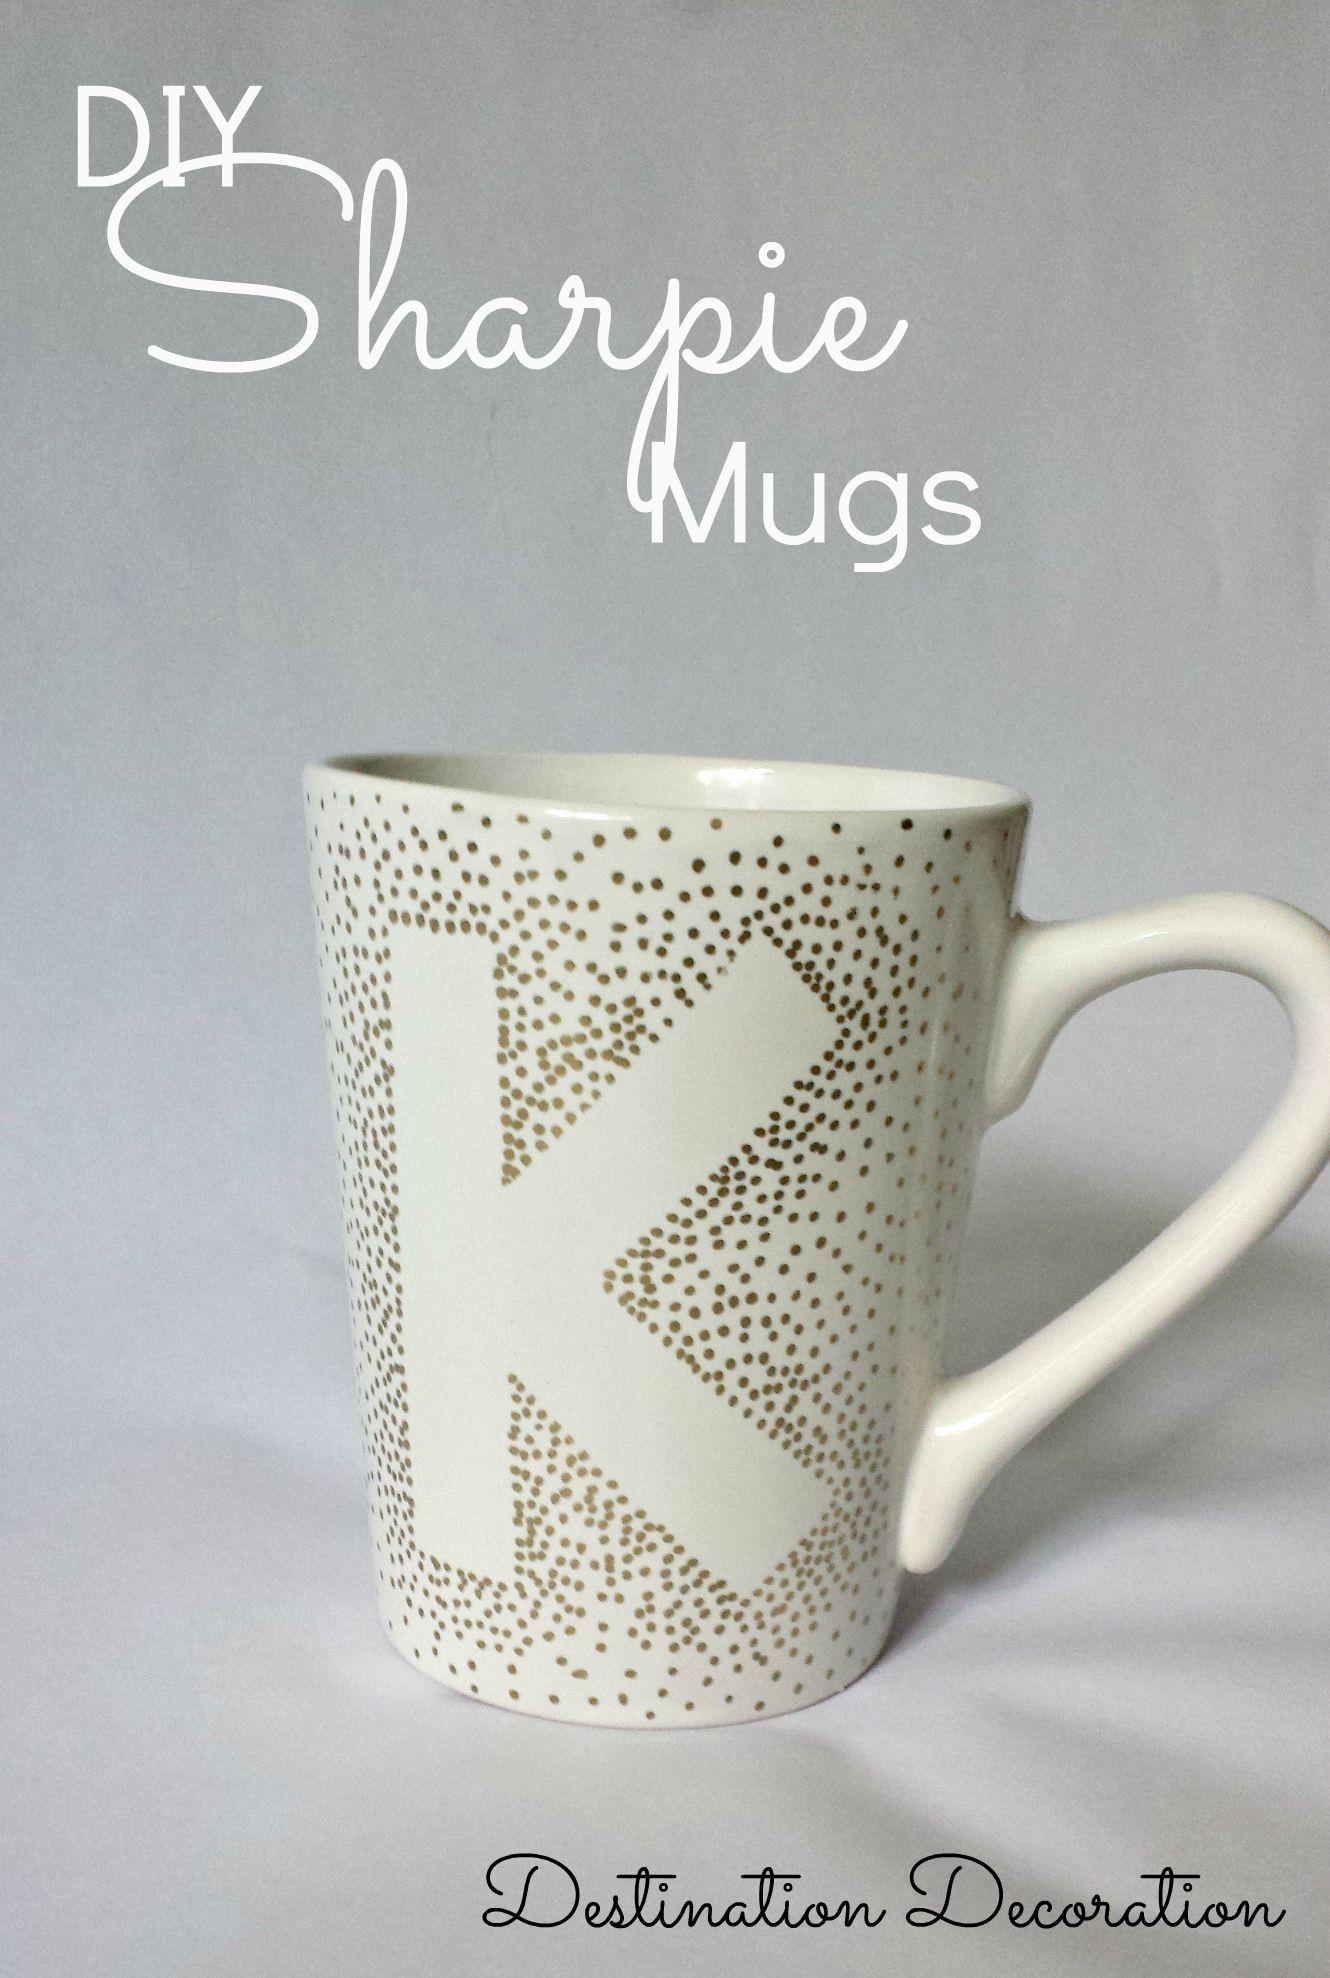 DIY Sharpie Mugs Using Dollar Tree Mugs | Diy sharpie mug ...